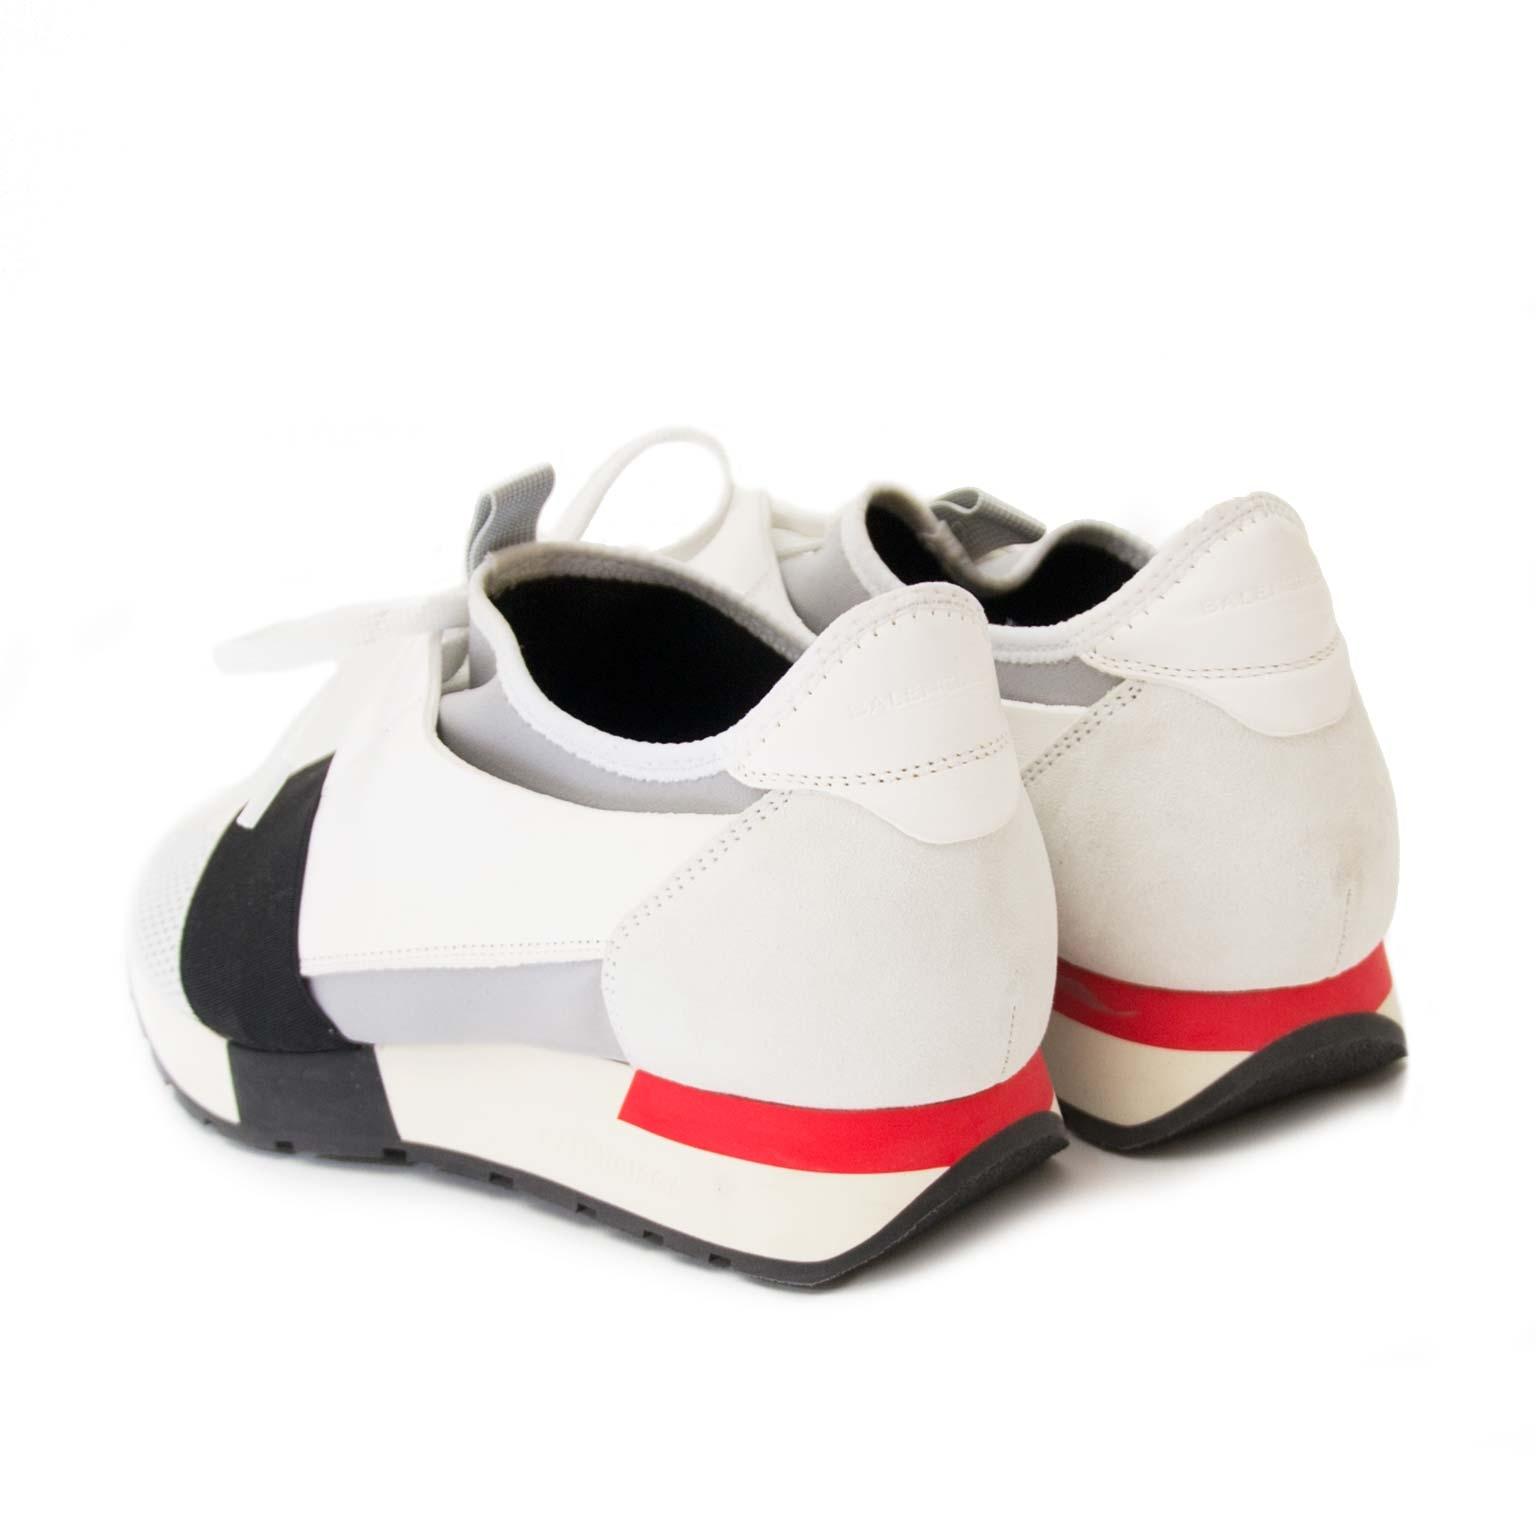 balenciaga race runner white now for sale at labellov vintage fashion webshop belgium